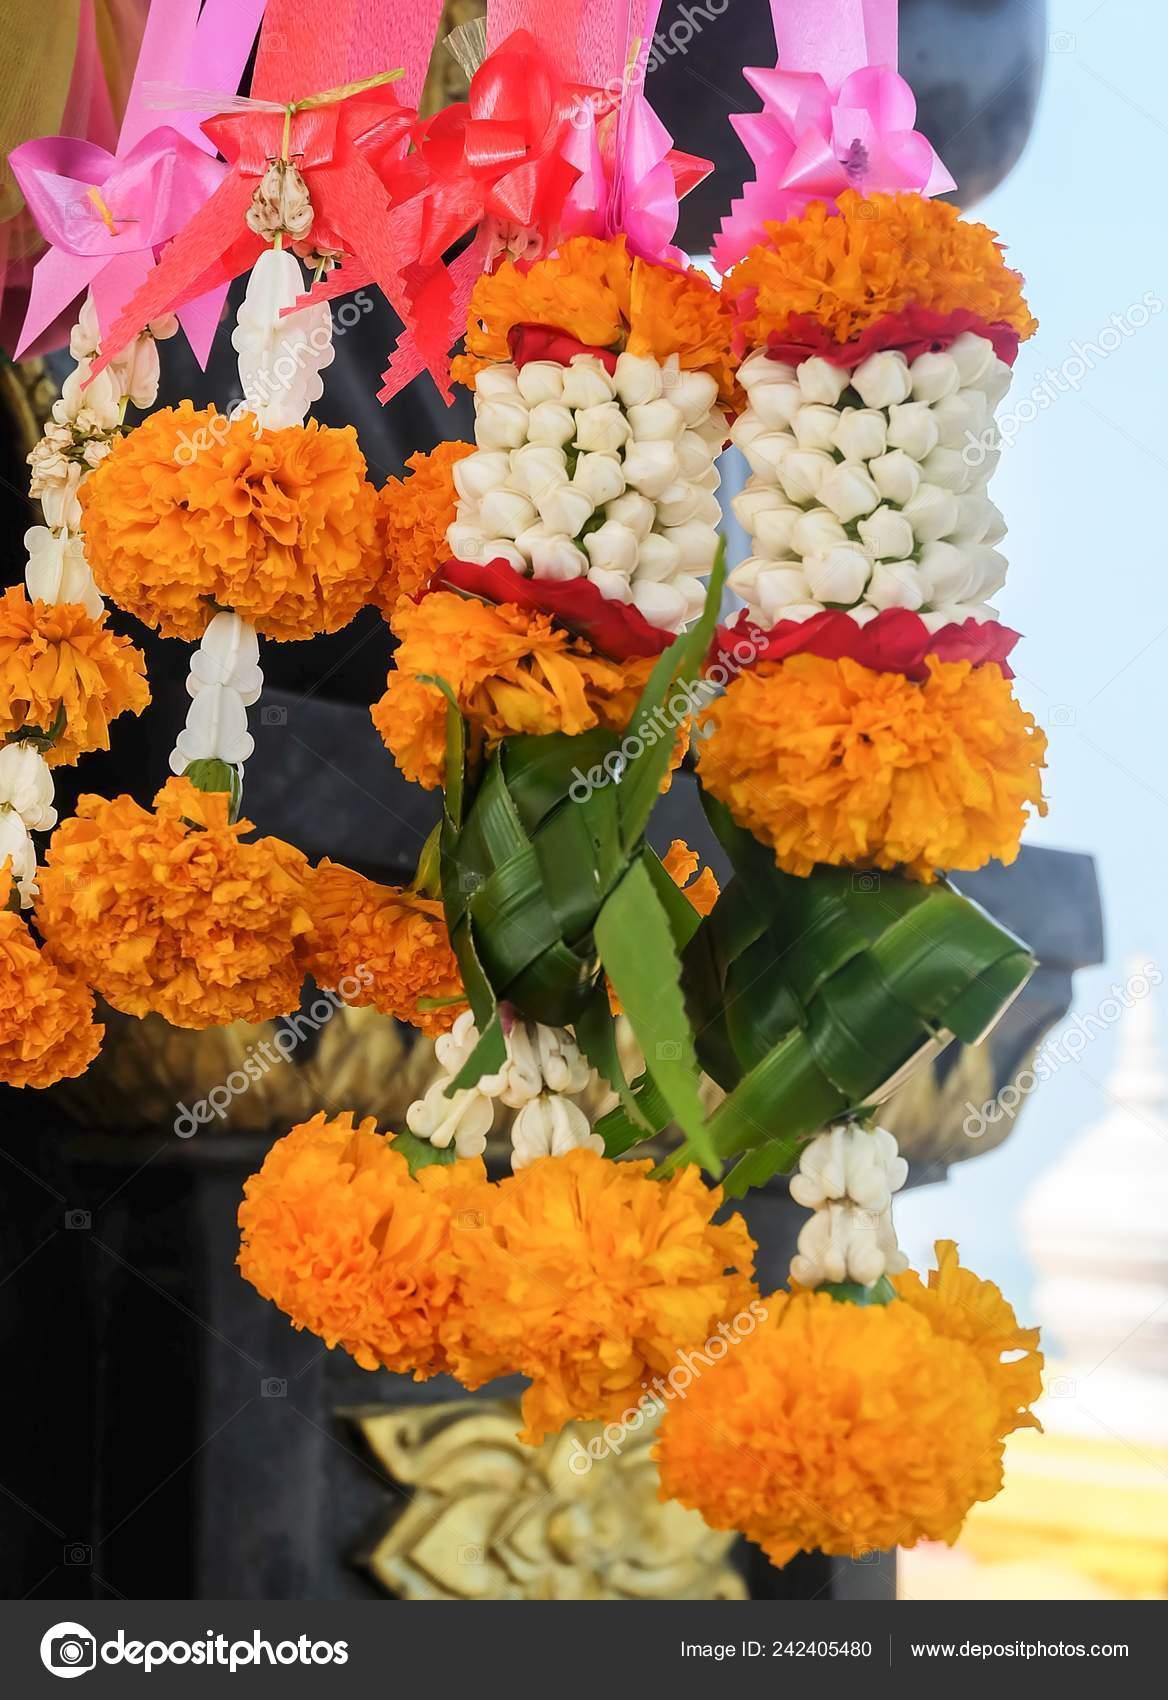 Beautiful Jasmine Wreaths Garlands Red Roses Blossoms Yellow Marigold Pink Stock Photo C Arayabandit 242405480